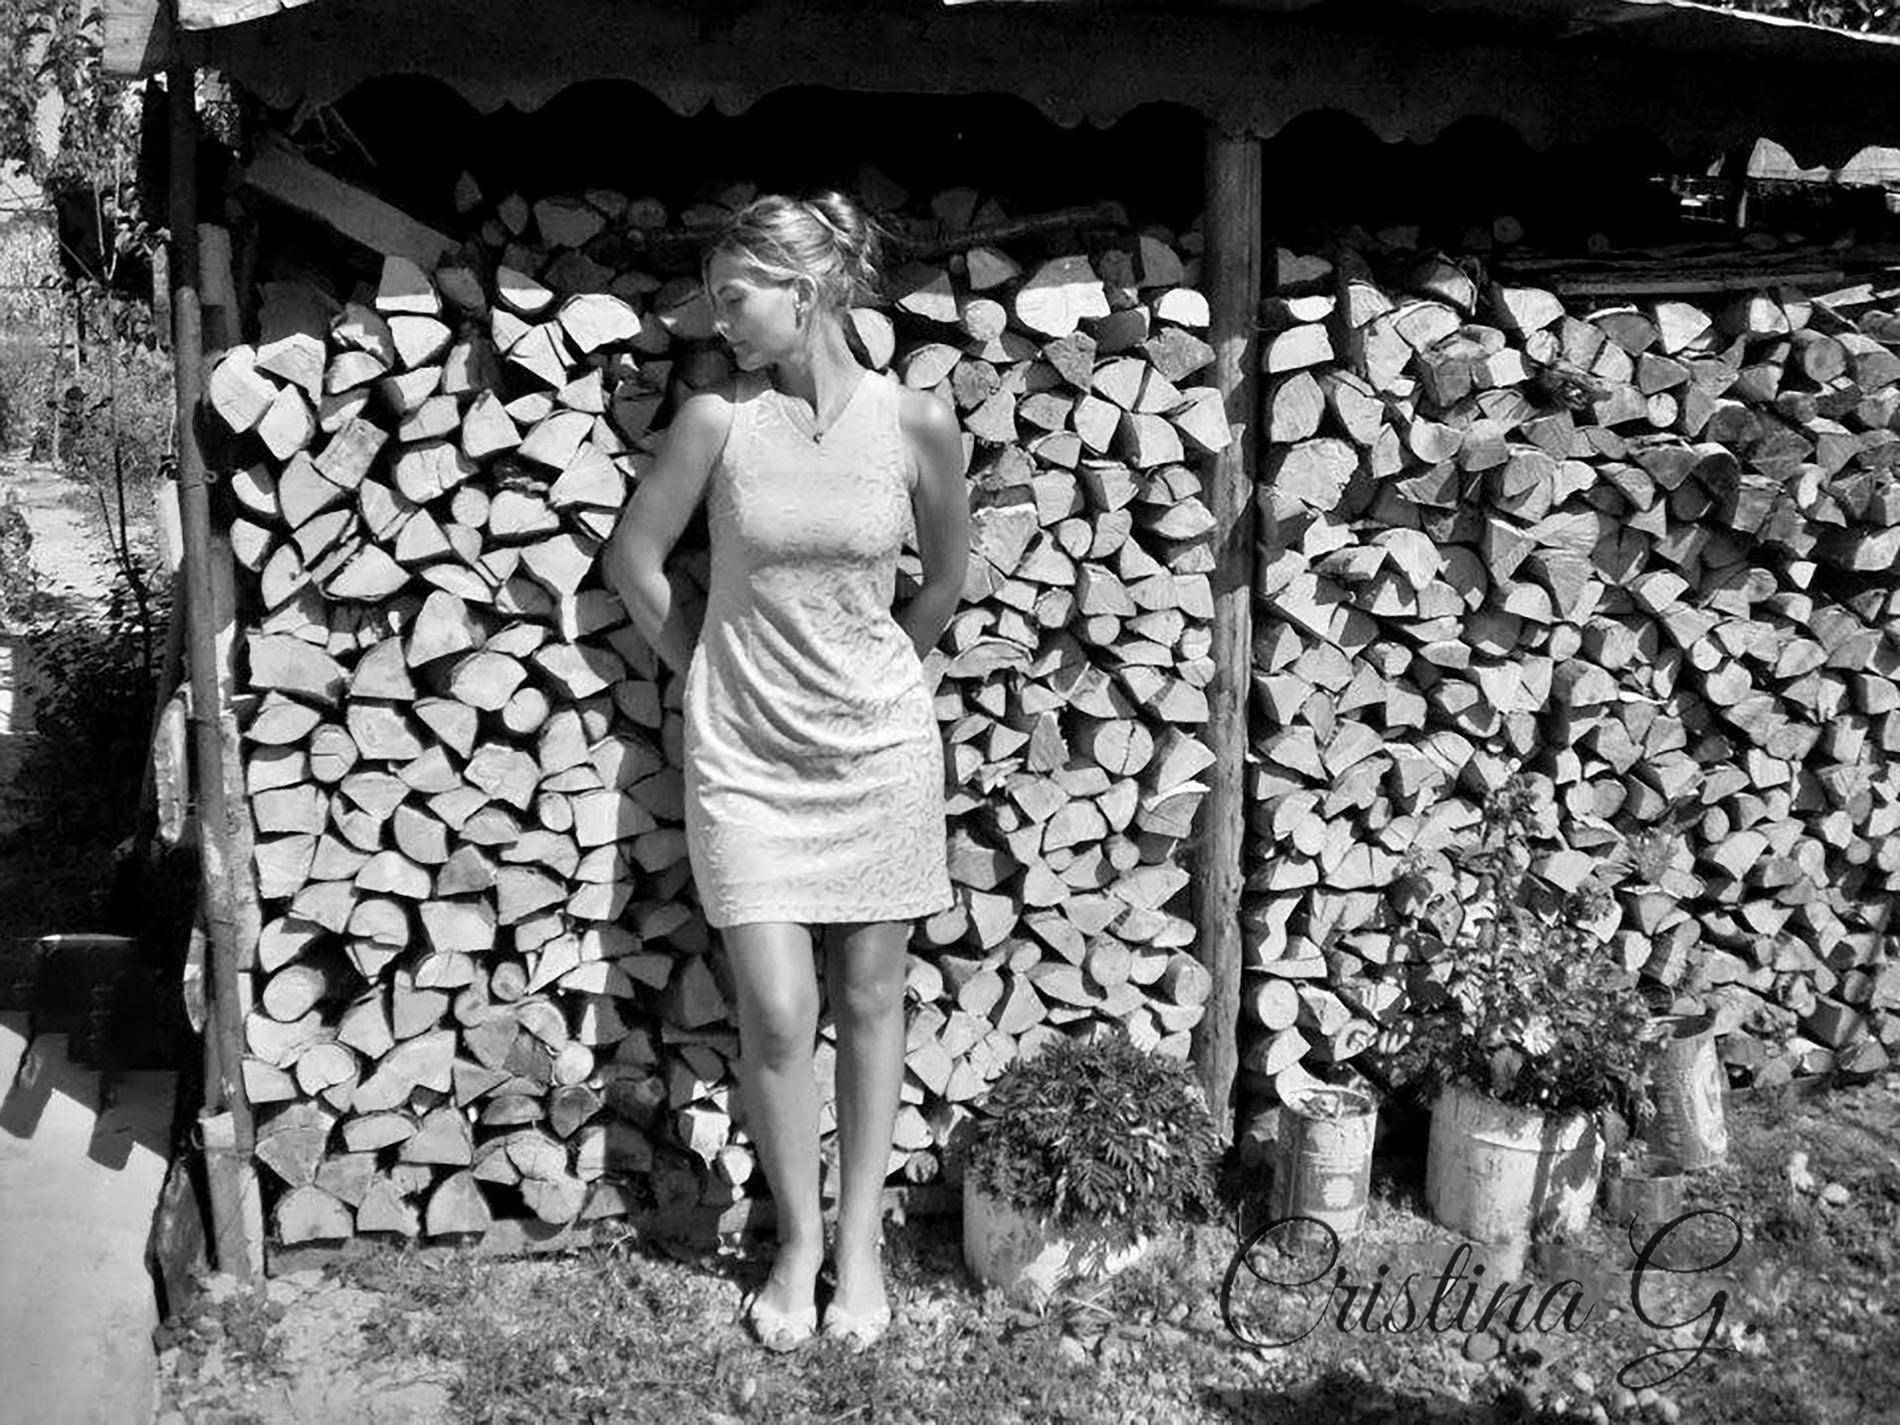 Haina îl face pe om sau omul face haina? – guest post Cristina Gherghel